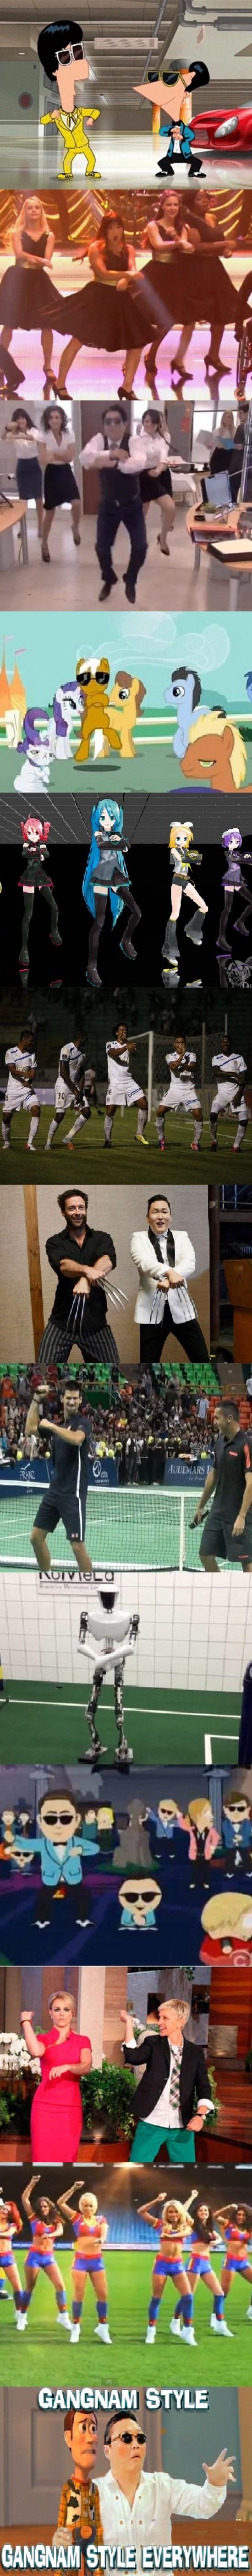 Otros - Gangnam Style, Gangnam Style everywhere